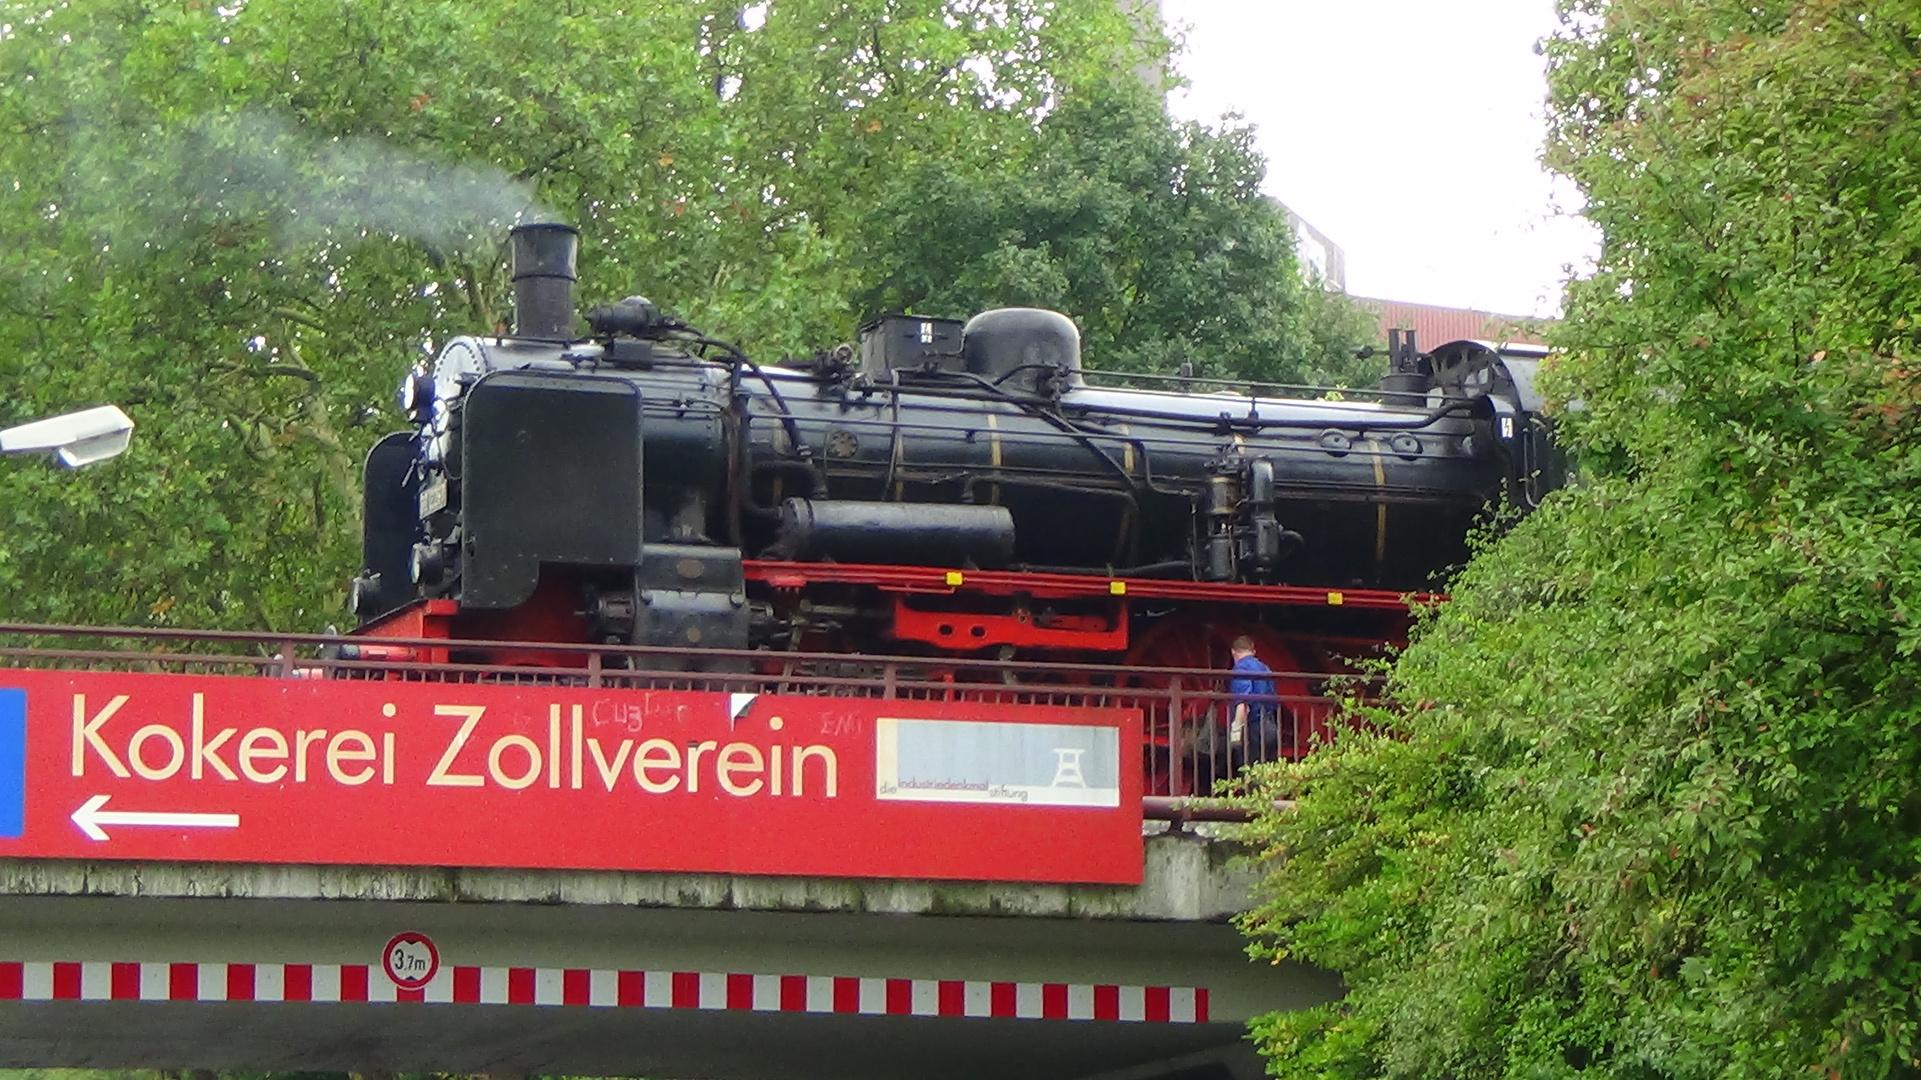 P8 auf Zollverein (III)